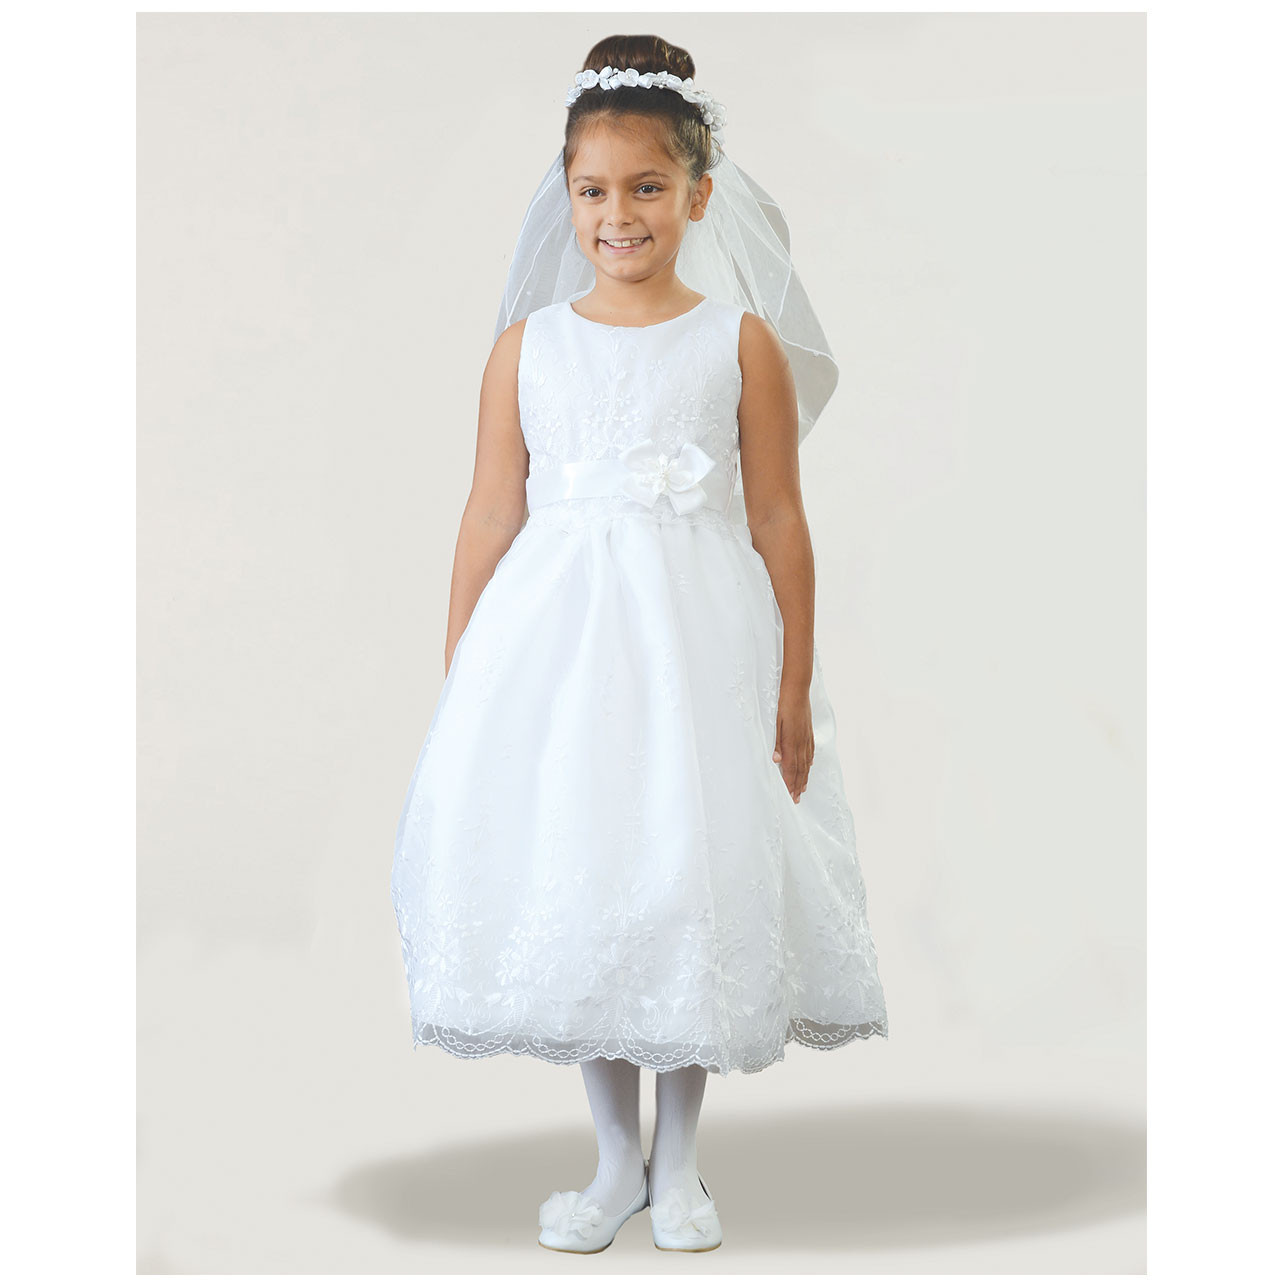 Front of Rosemarie Communion Dress